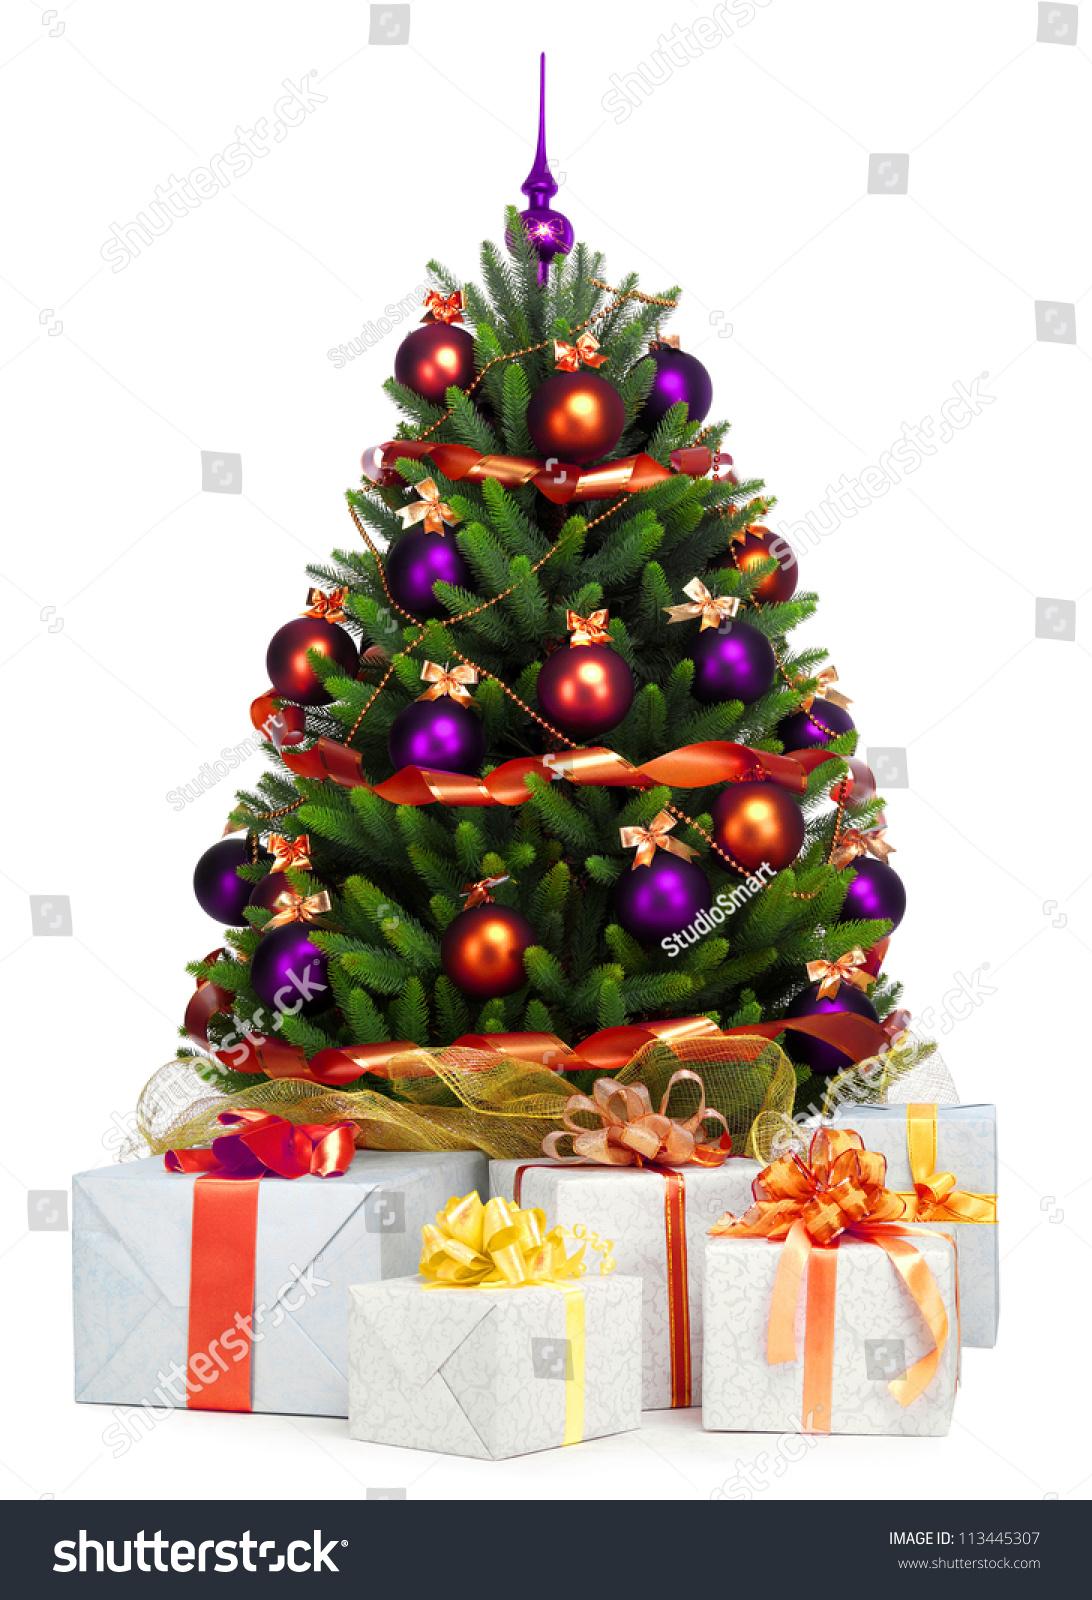 Decorated Christmas Tree On White Background Stock Photo 113445307